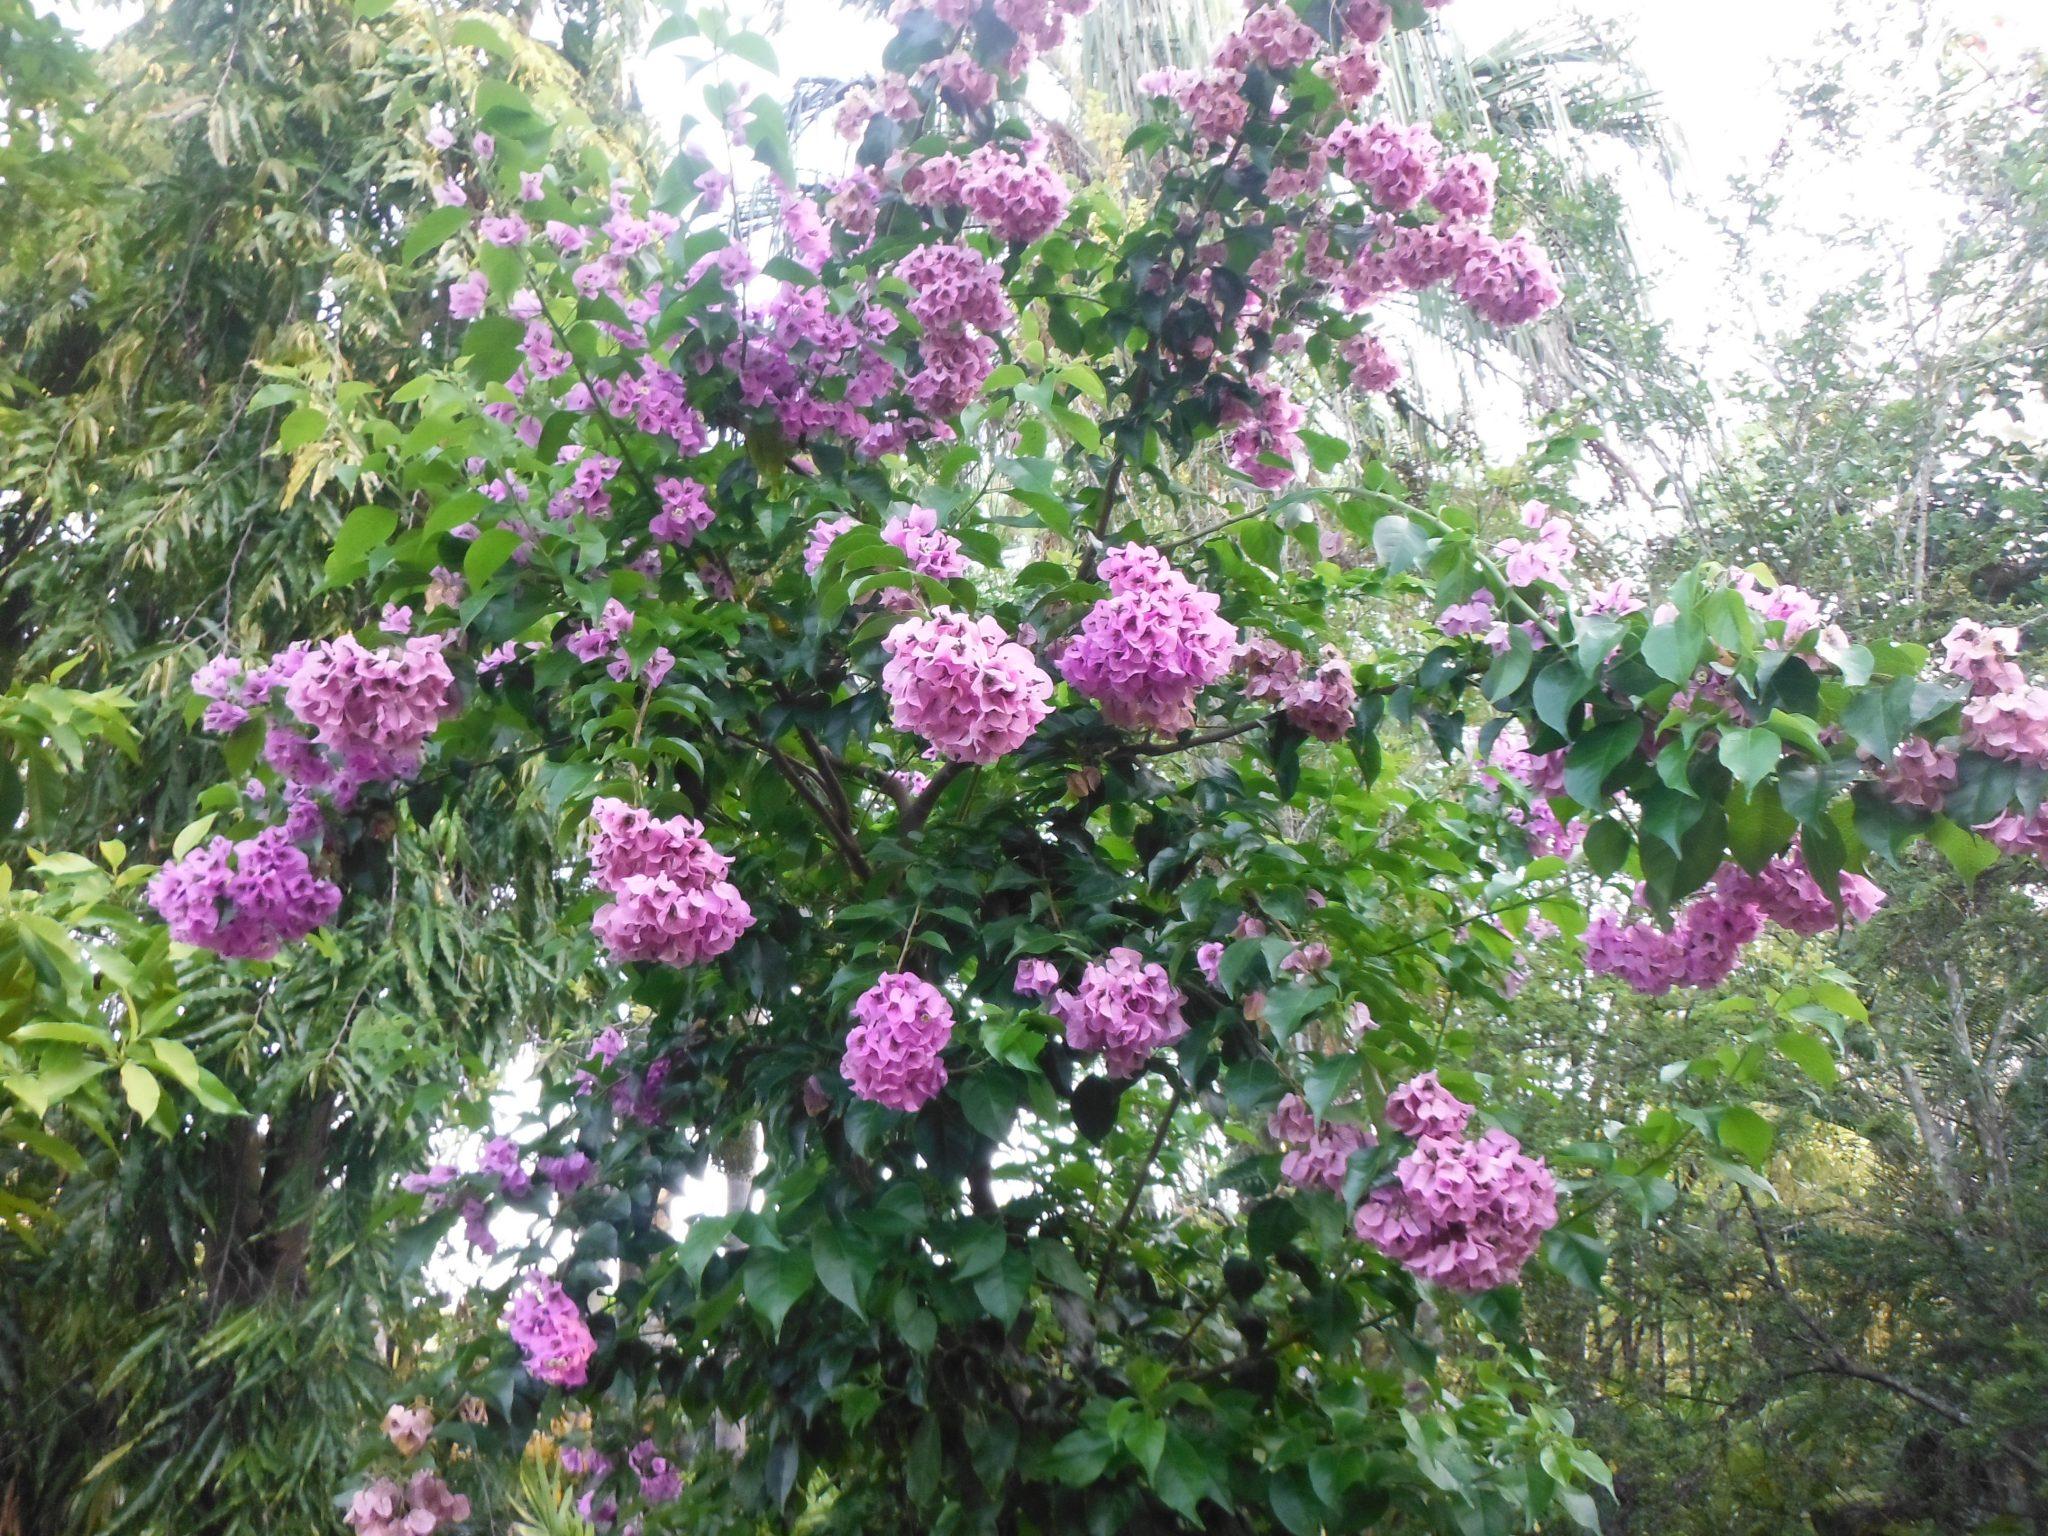 Transplanting Trees and Shrubs - Richard Lyons Nursery, Inc.